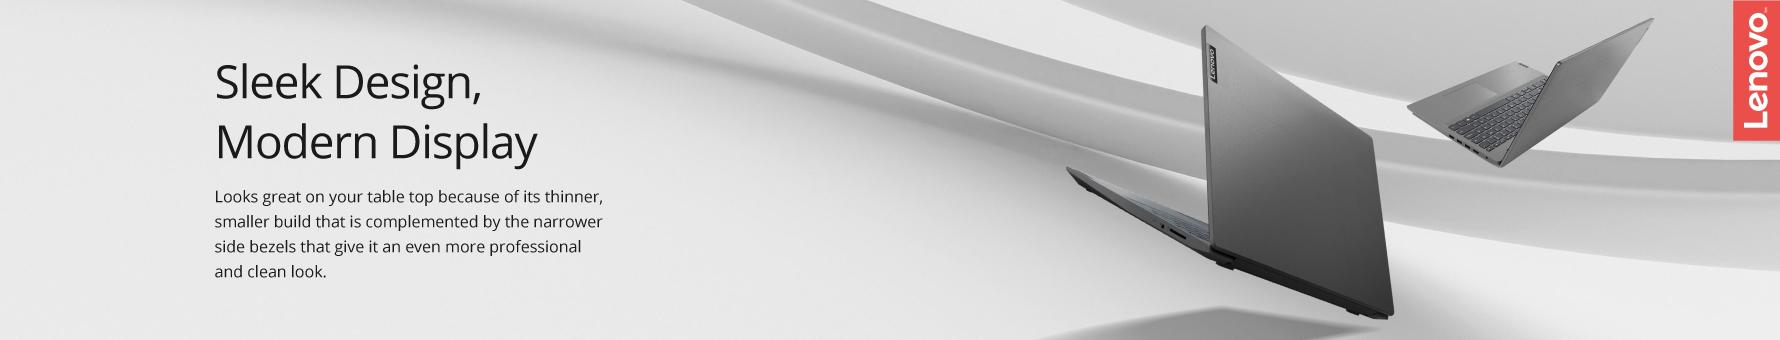 Sleek Design Modern Display